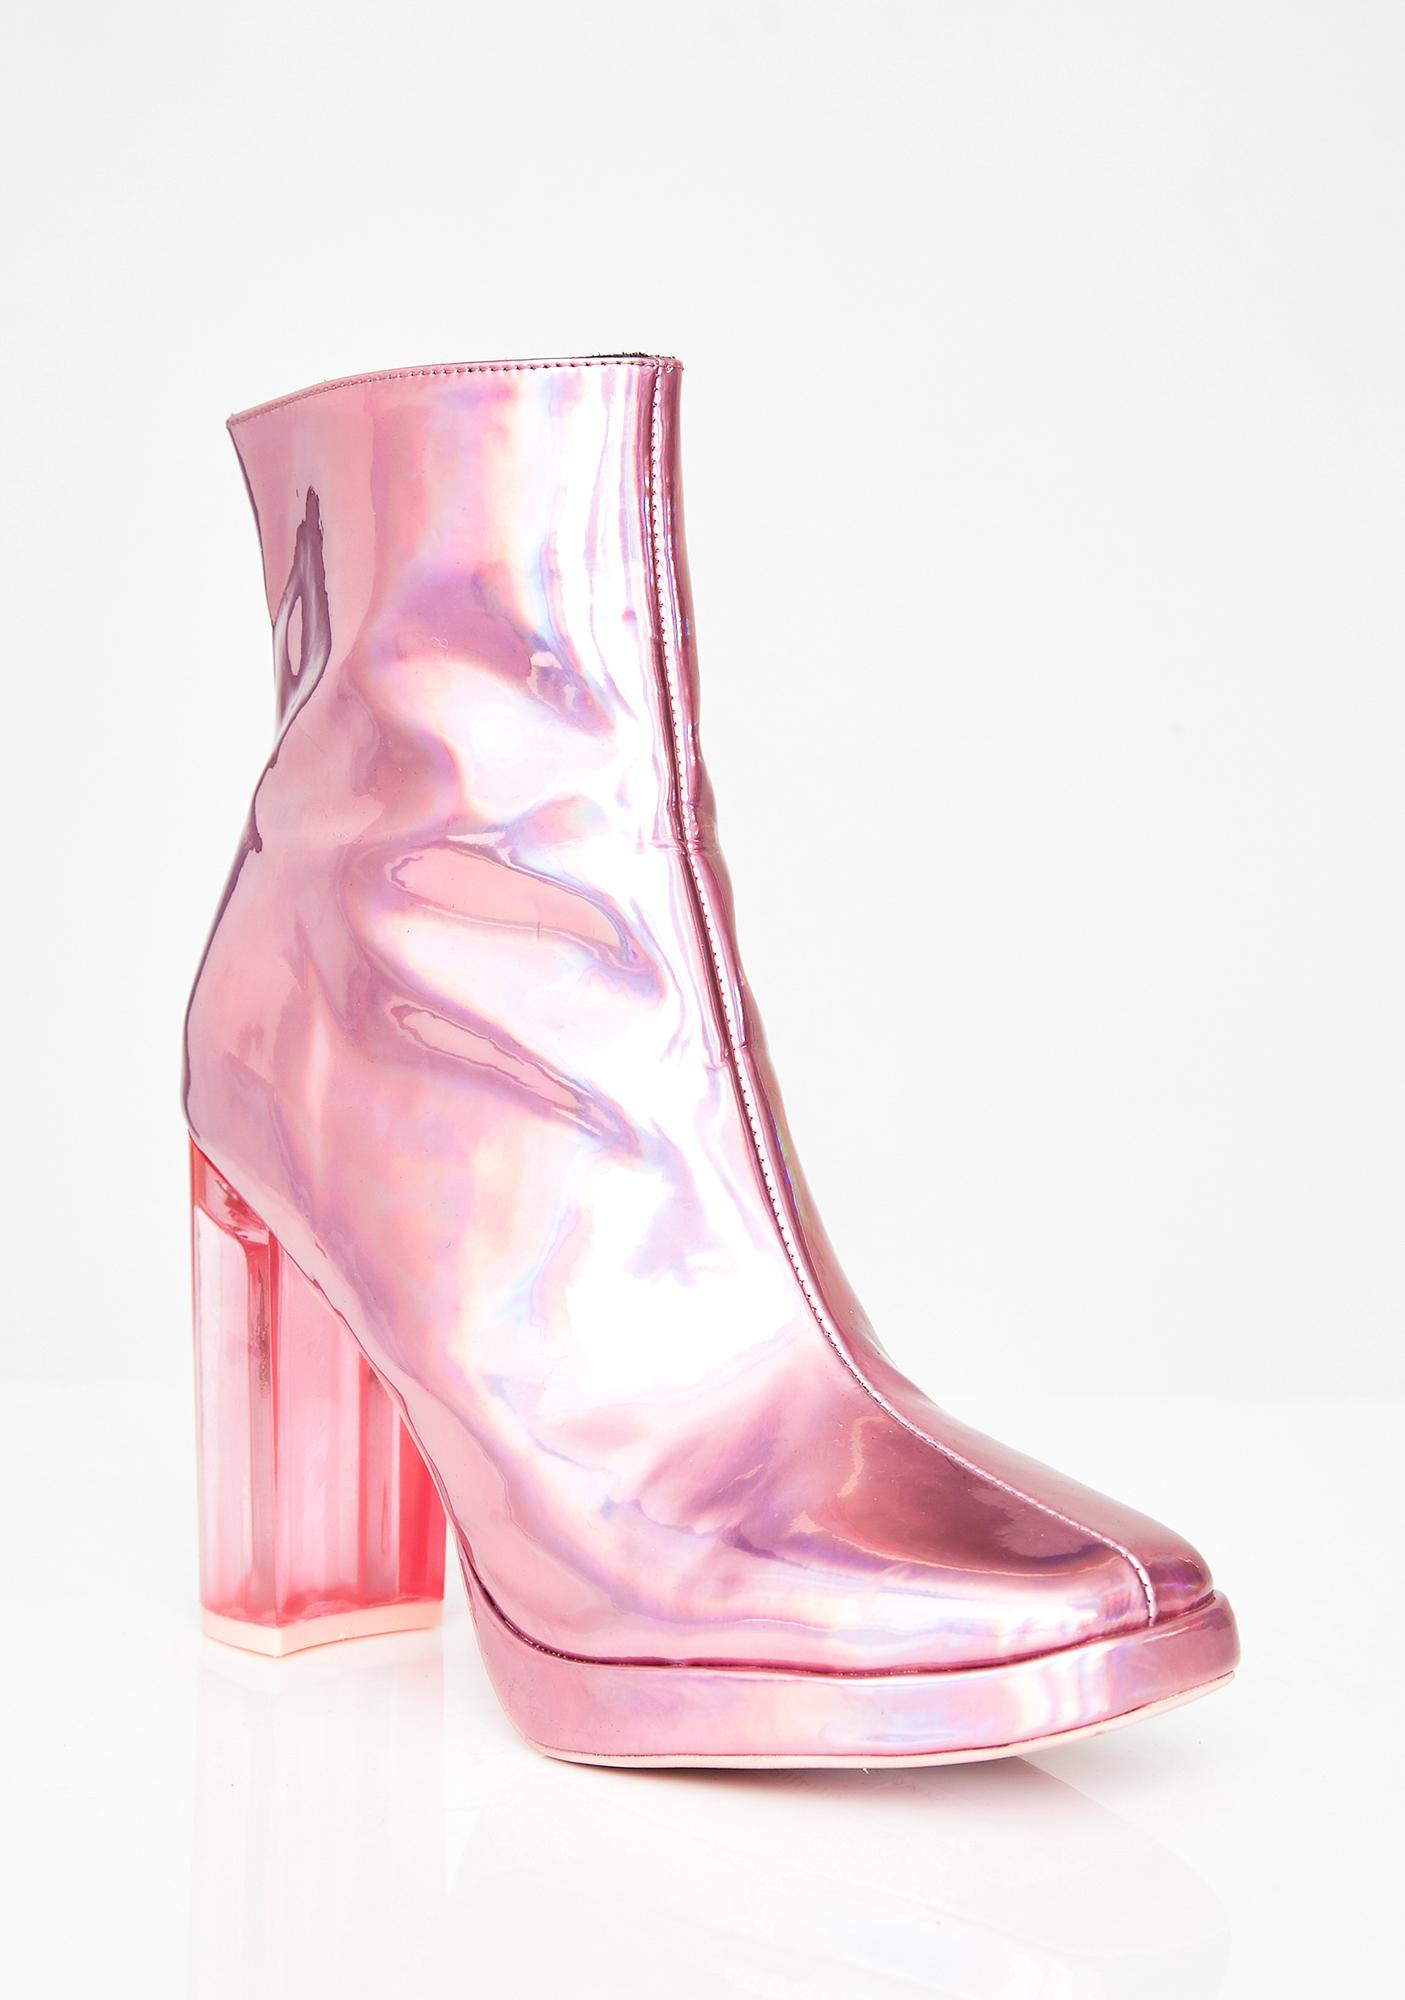 Sugar Thrillz Shagadelic Boots